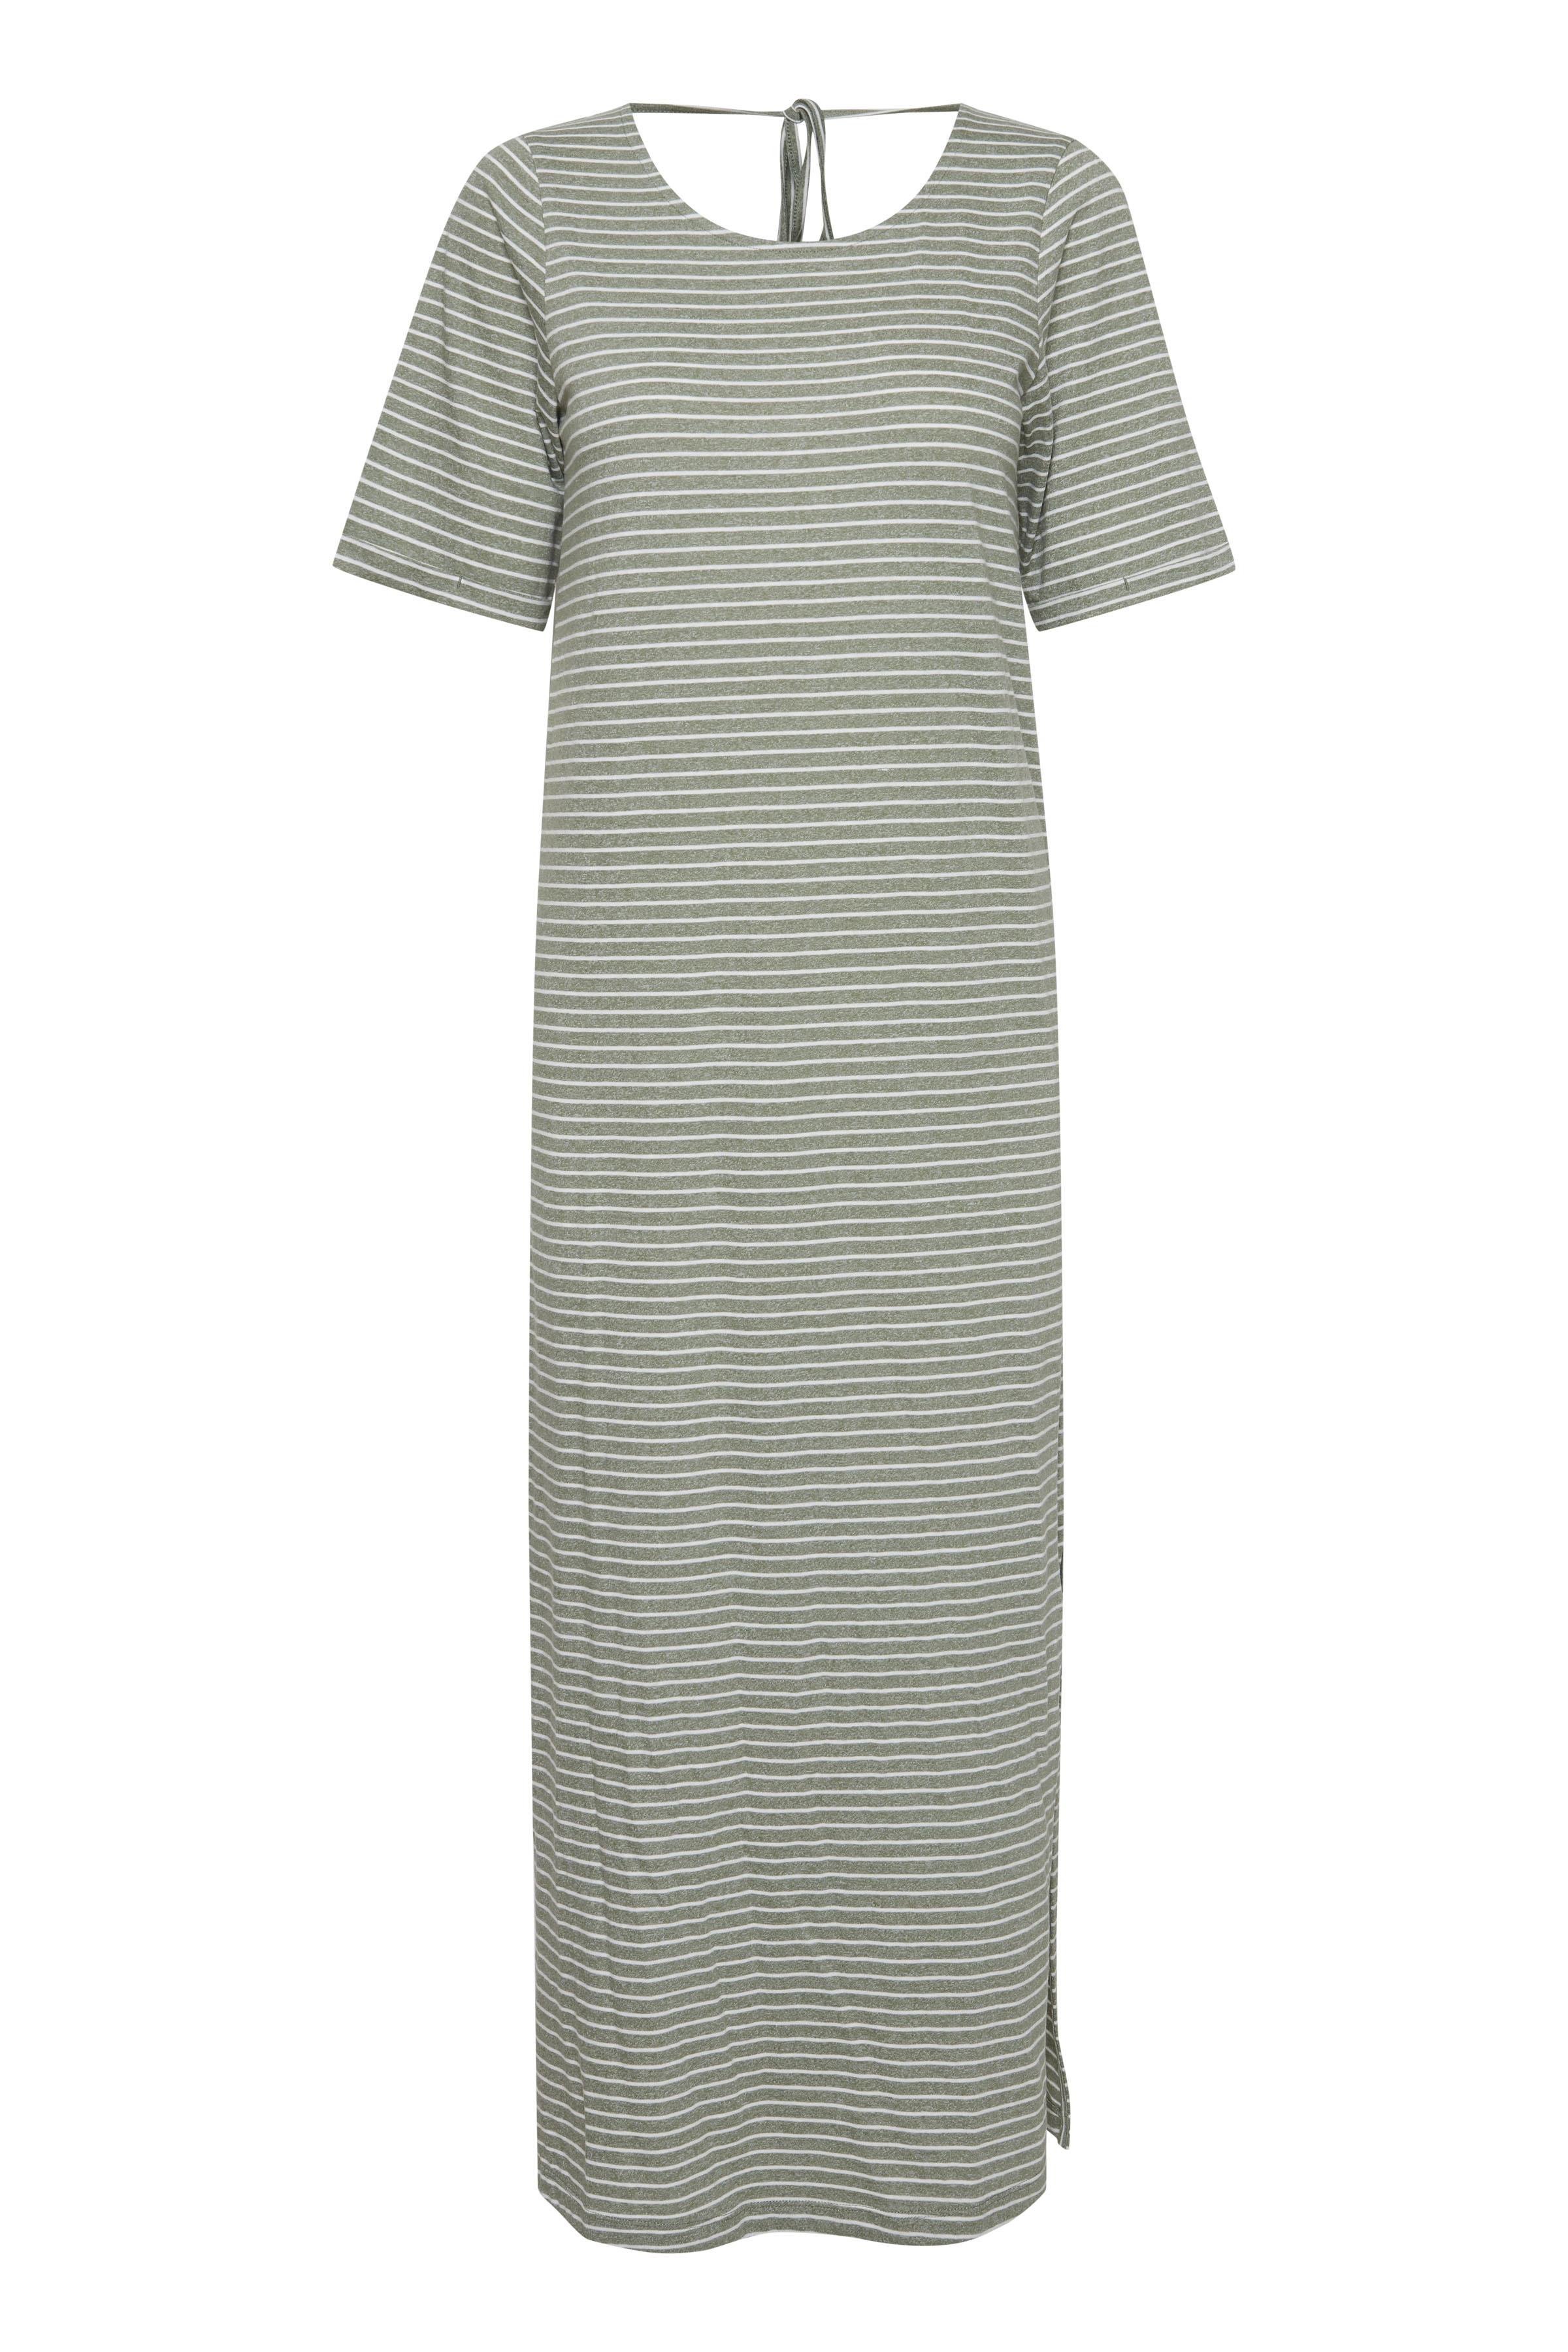 Ichi Dame Jerseykjole - Small Stripe Hedge Green